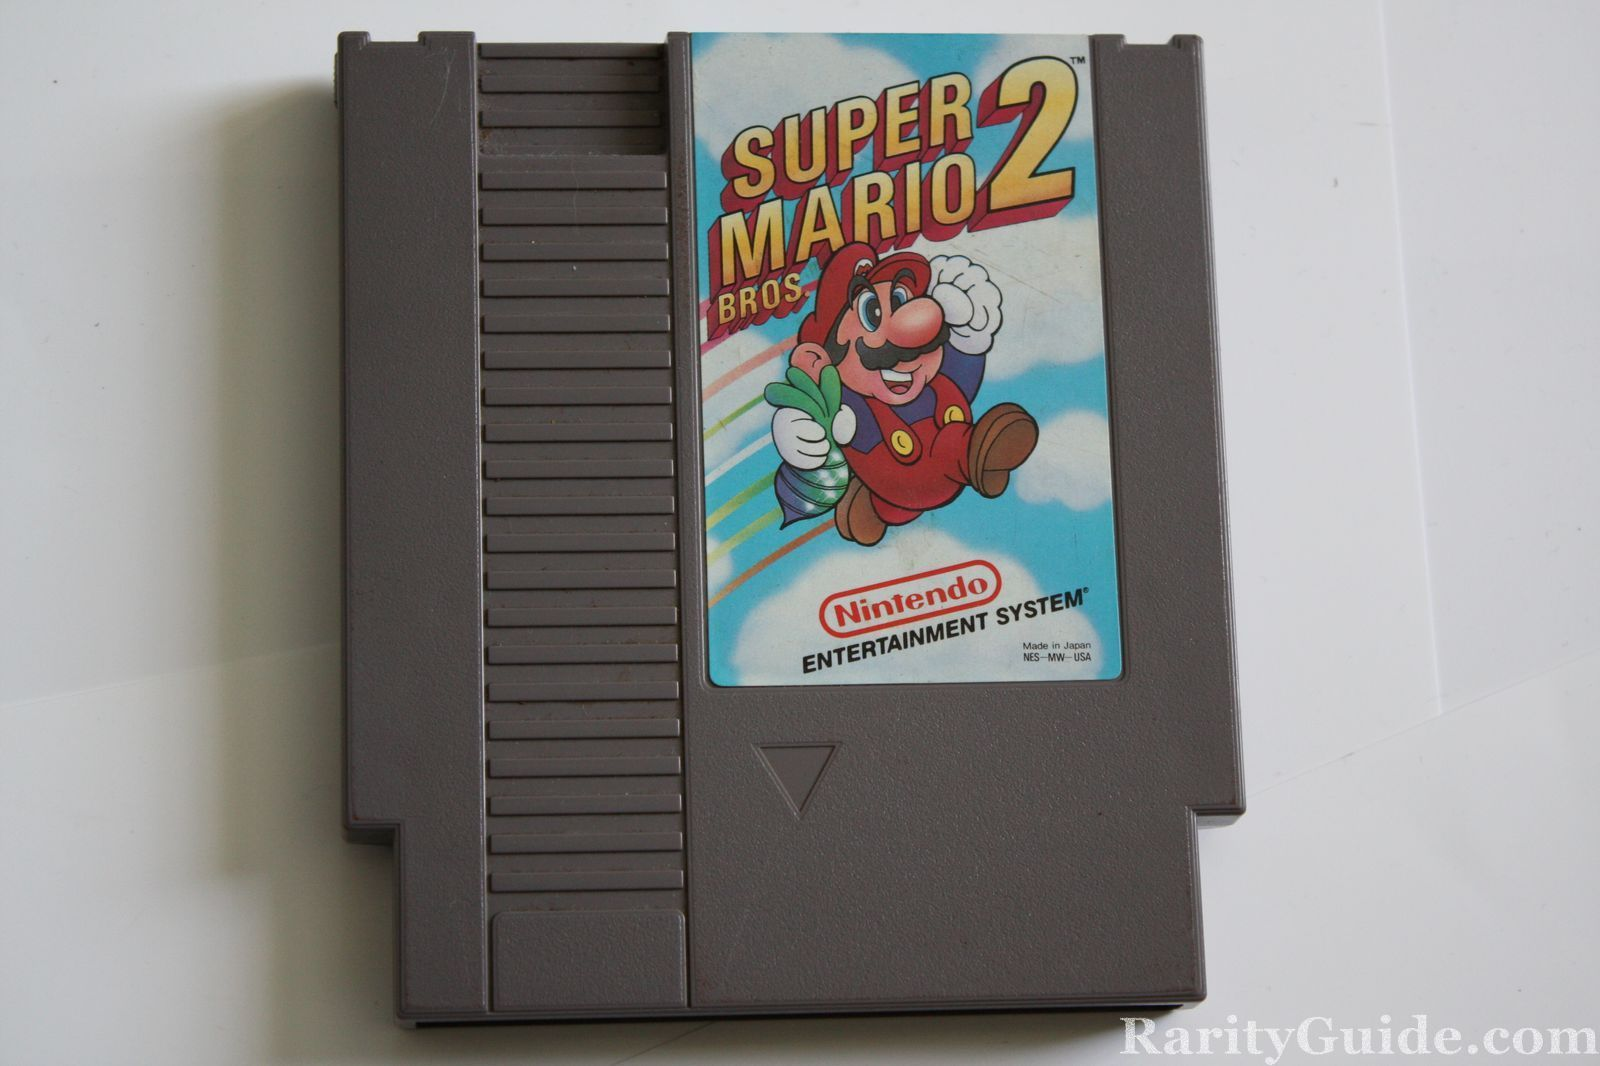 Nes Super Mario Bros 2 Jpg 1600 1066 Super Nintendo Games Video Games Nintendo Super Mario Bros